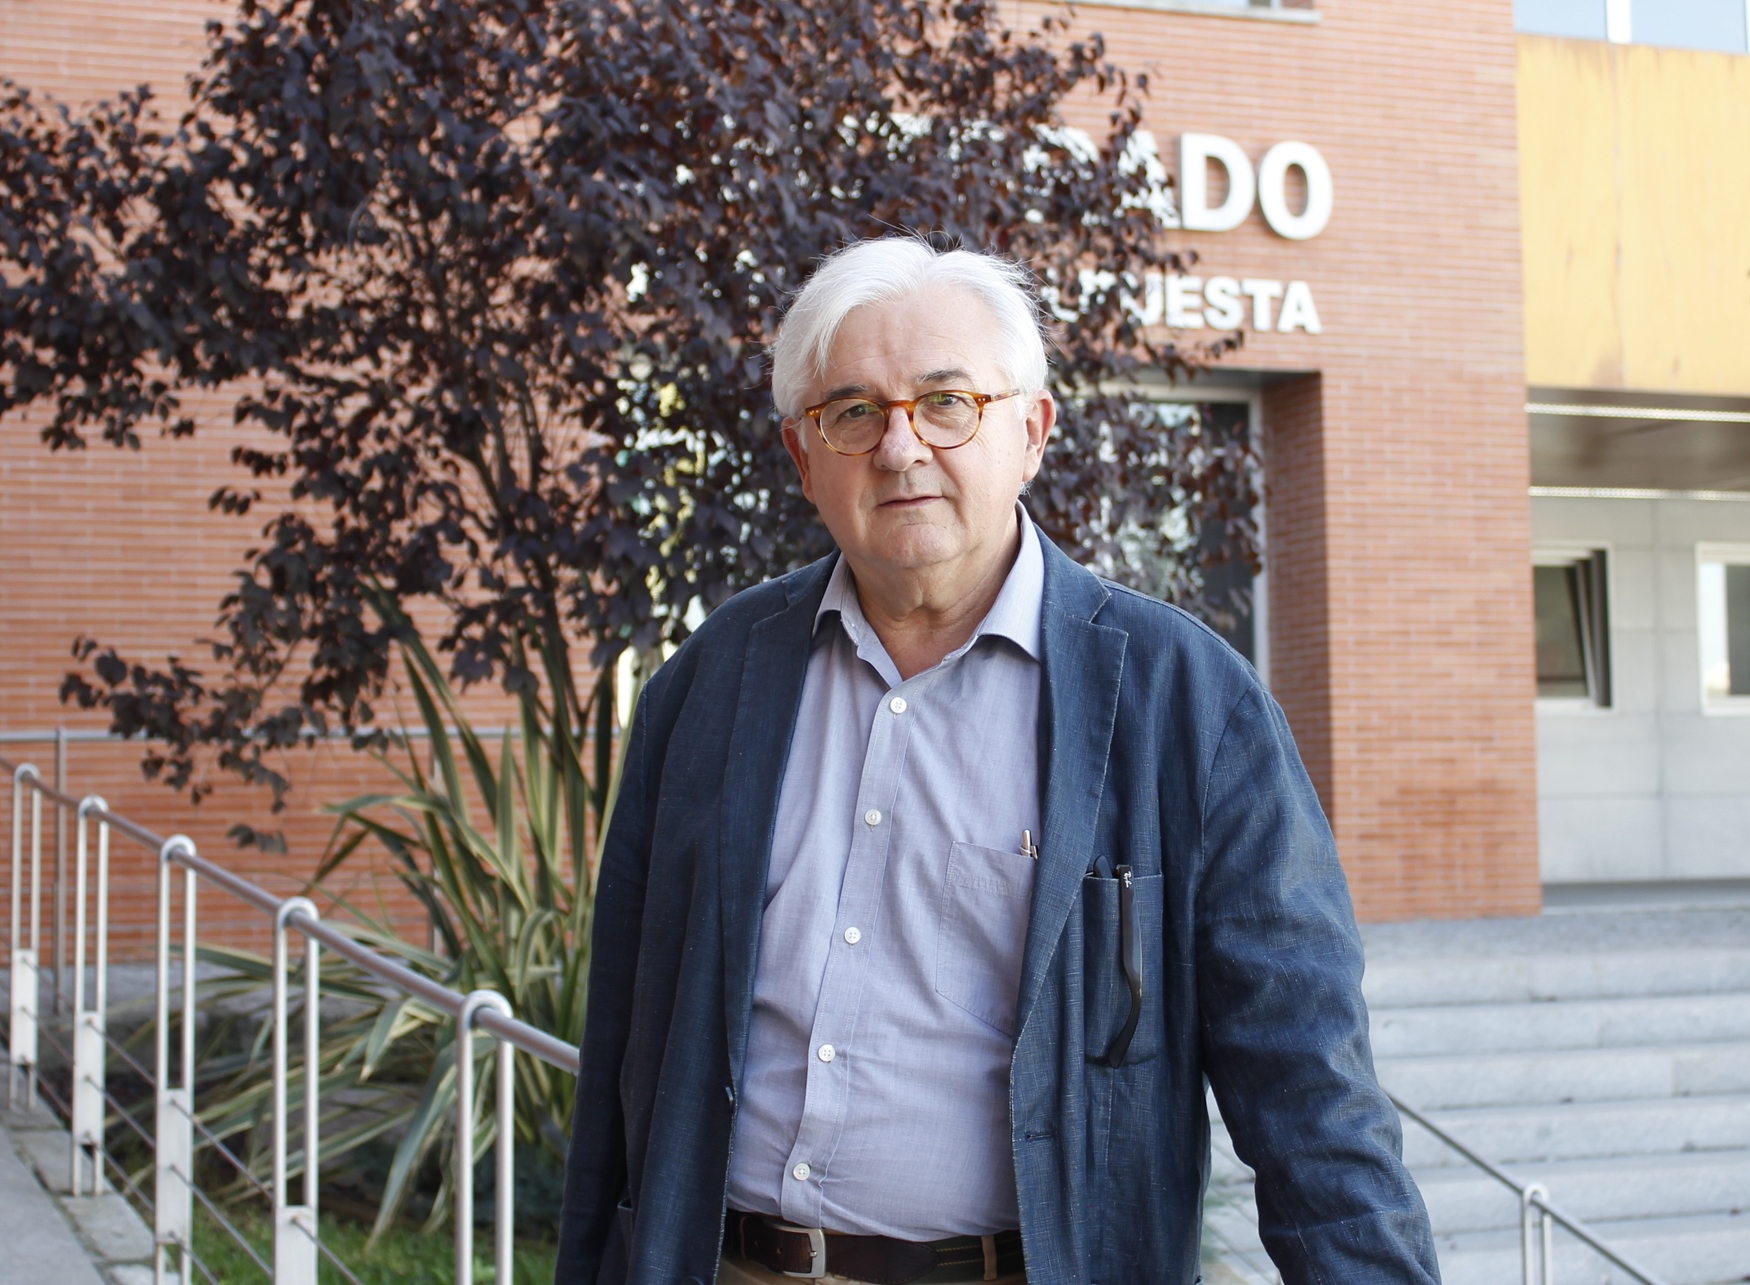 Juan Daniel Ramírez Garrido